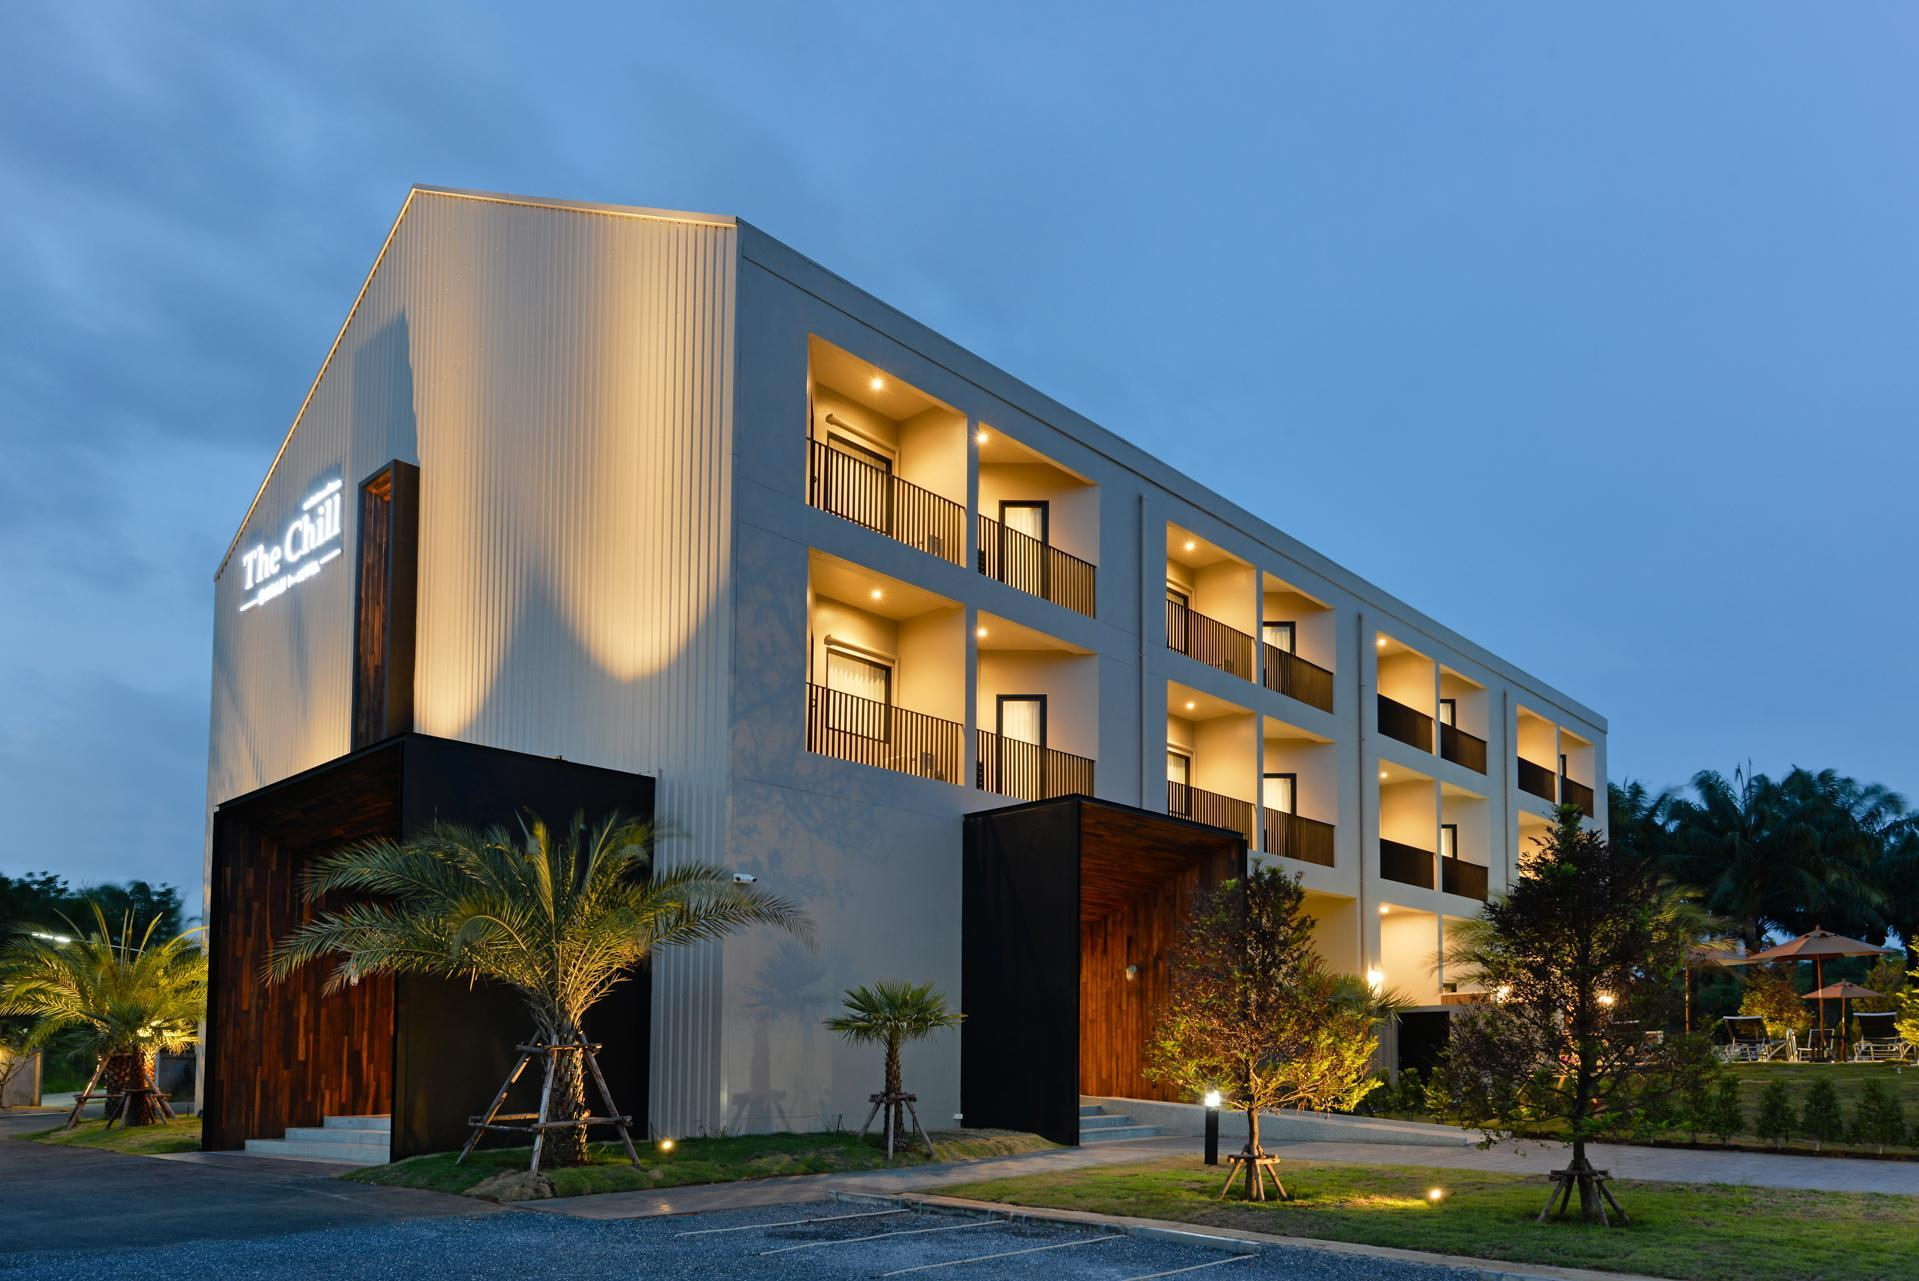 The Chill @ Krabi Hotel